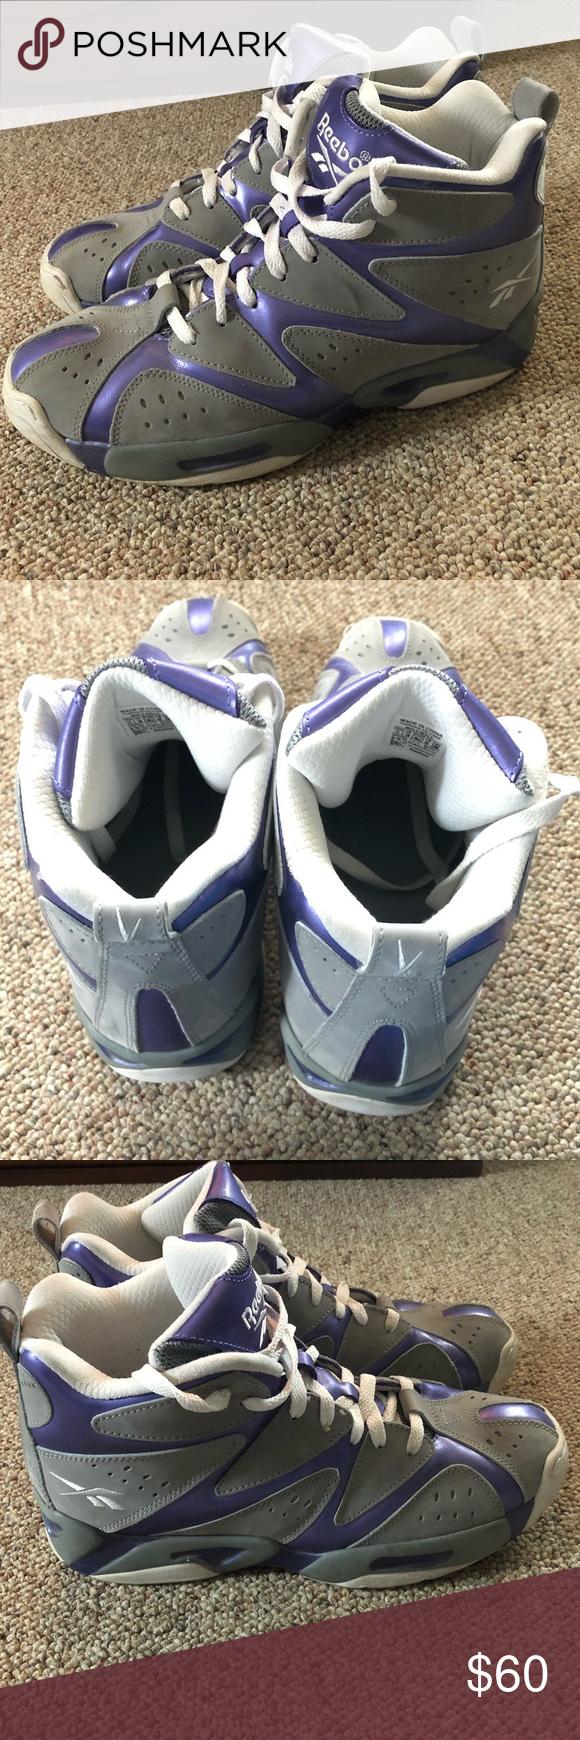 9f71a6ea5c07 Reebok Kamikaze High Top Basketball Shoe This is a very nice pair of Reebok  kamikazes